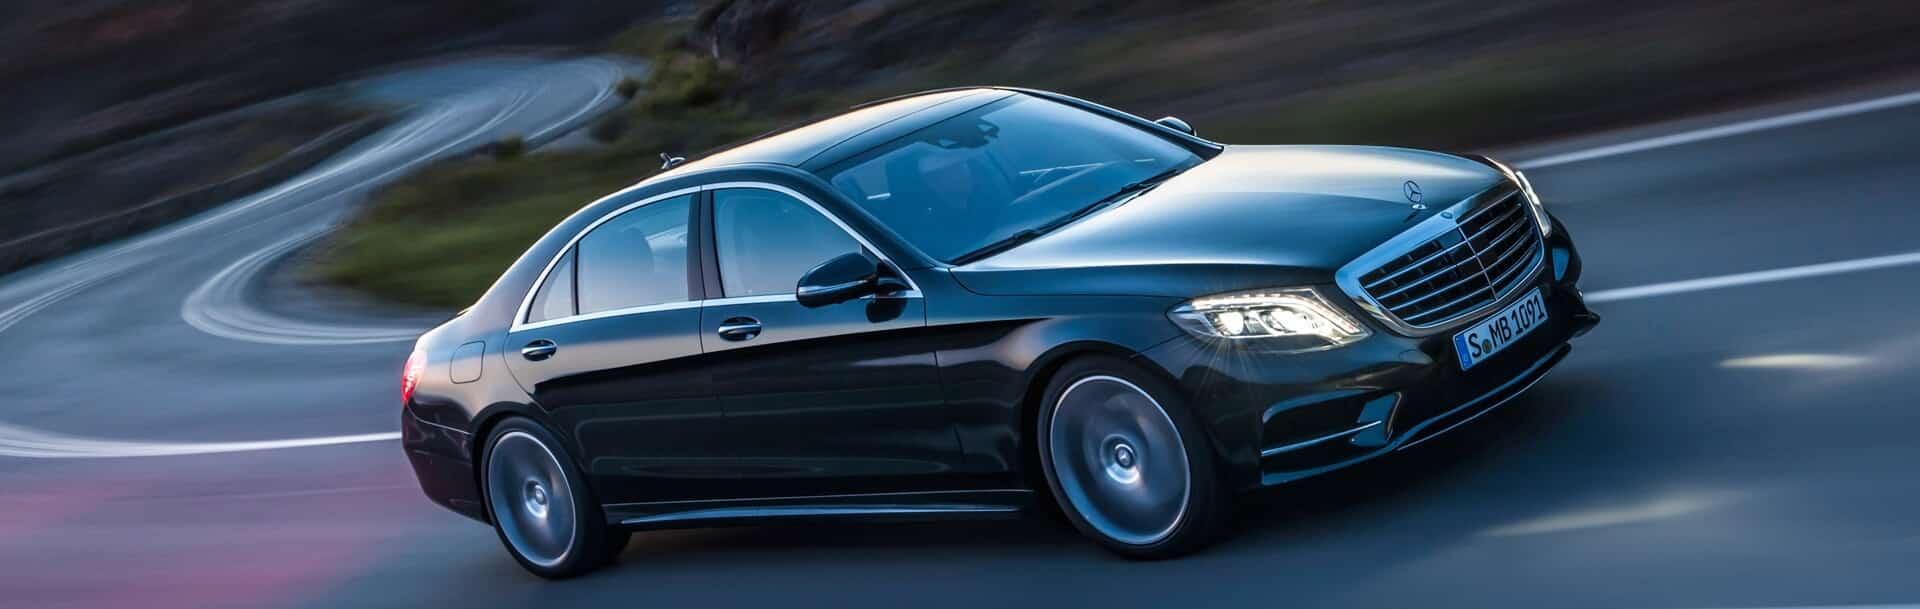 Alfa romeo c4 spider rental las vegas exotic cars vegas for Mercedes benz rental las vegas